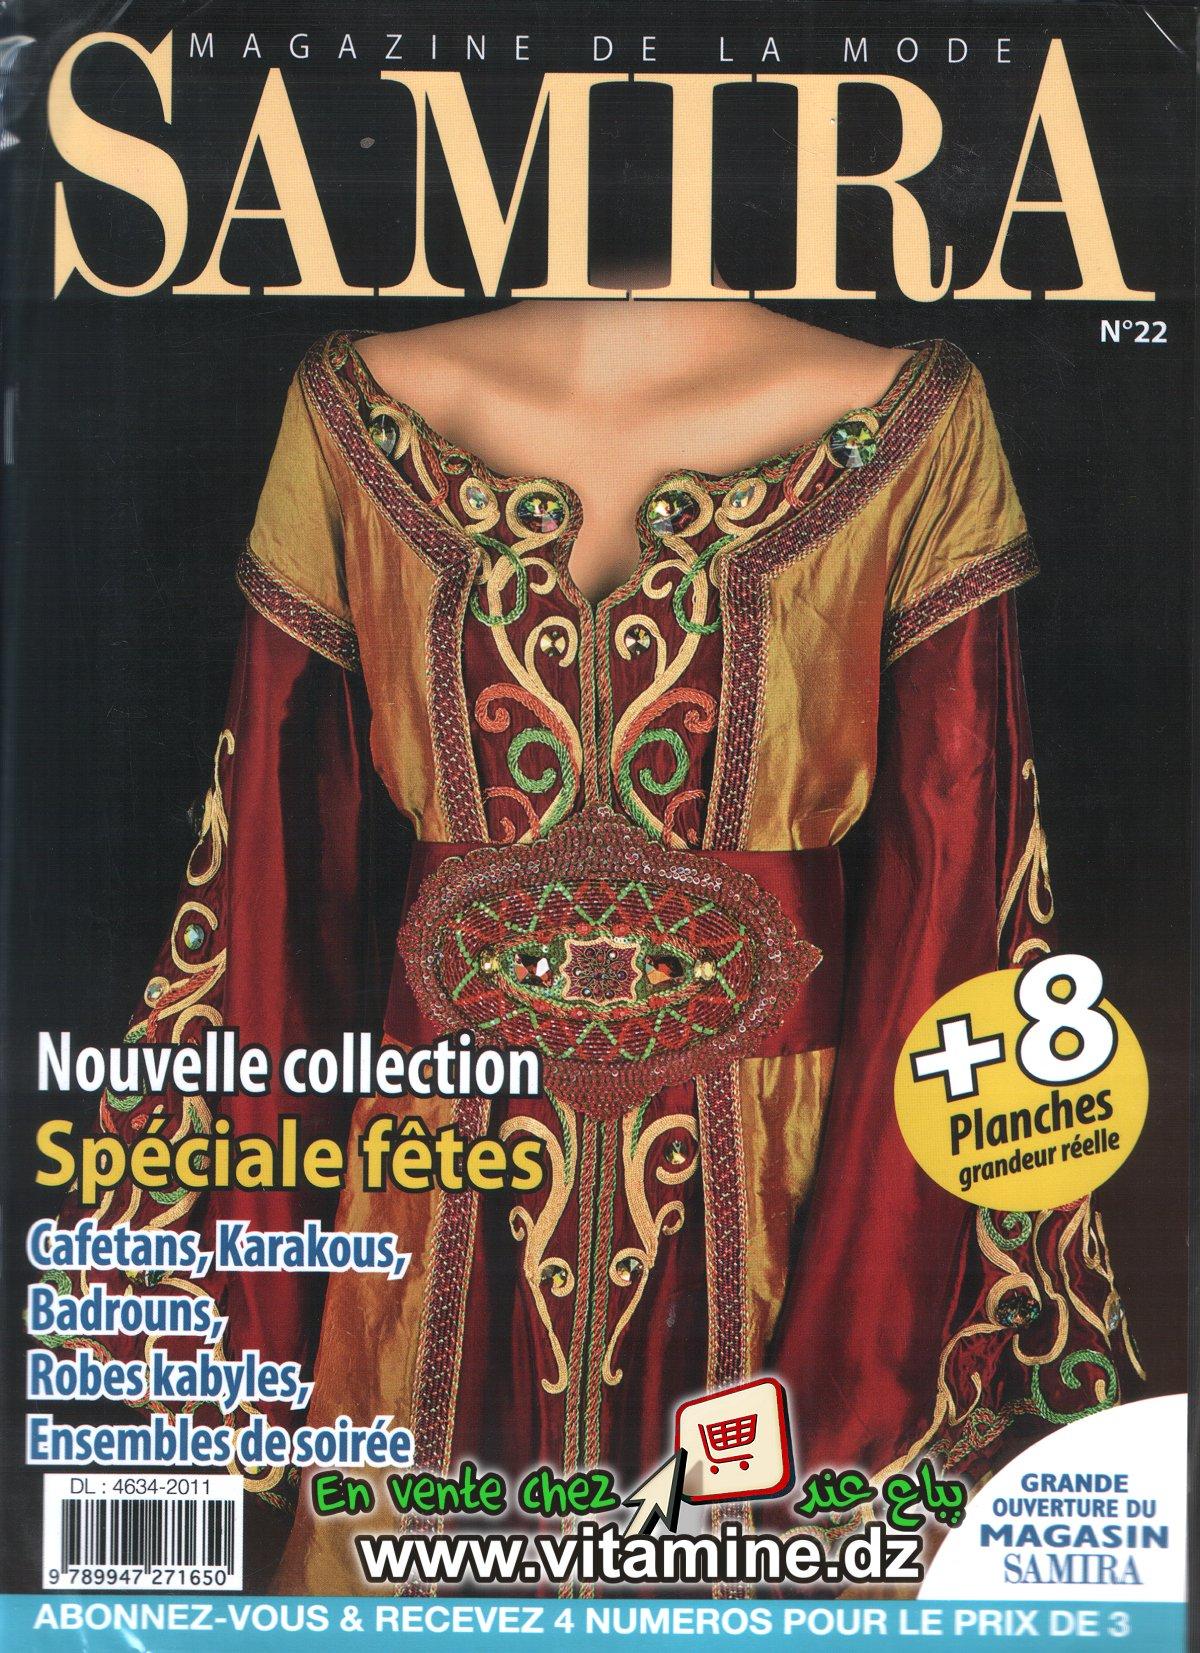 Samira N°22 - Magazine de Mode